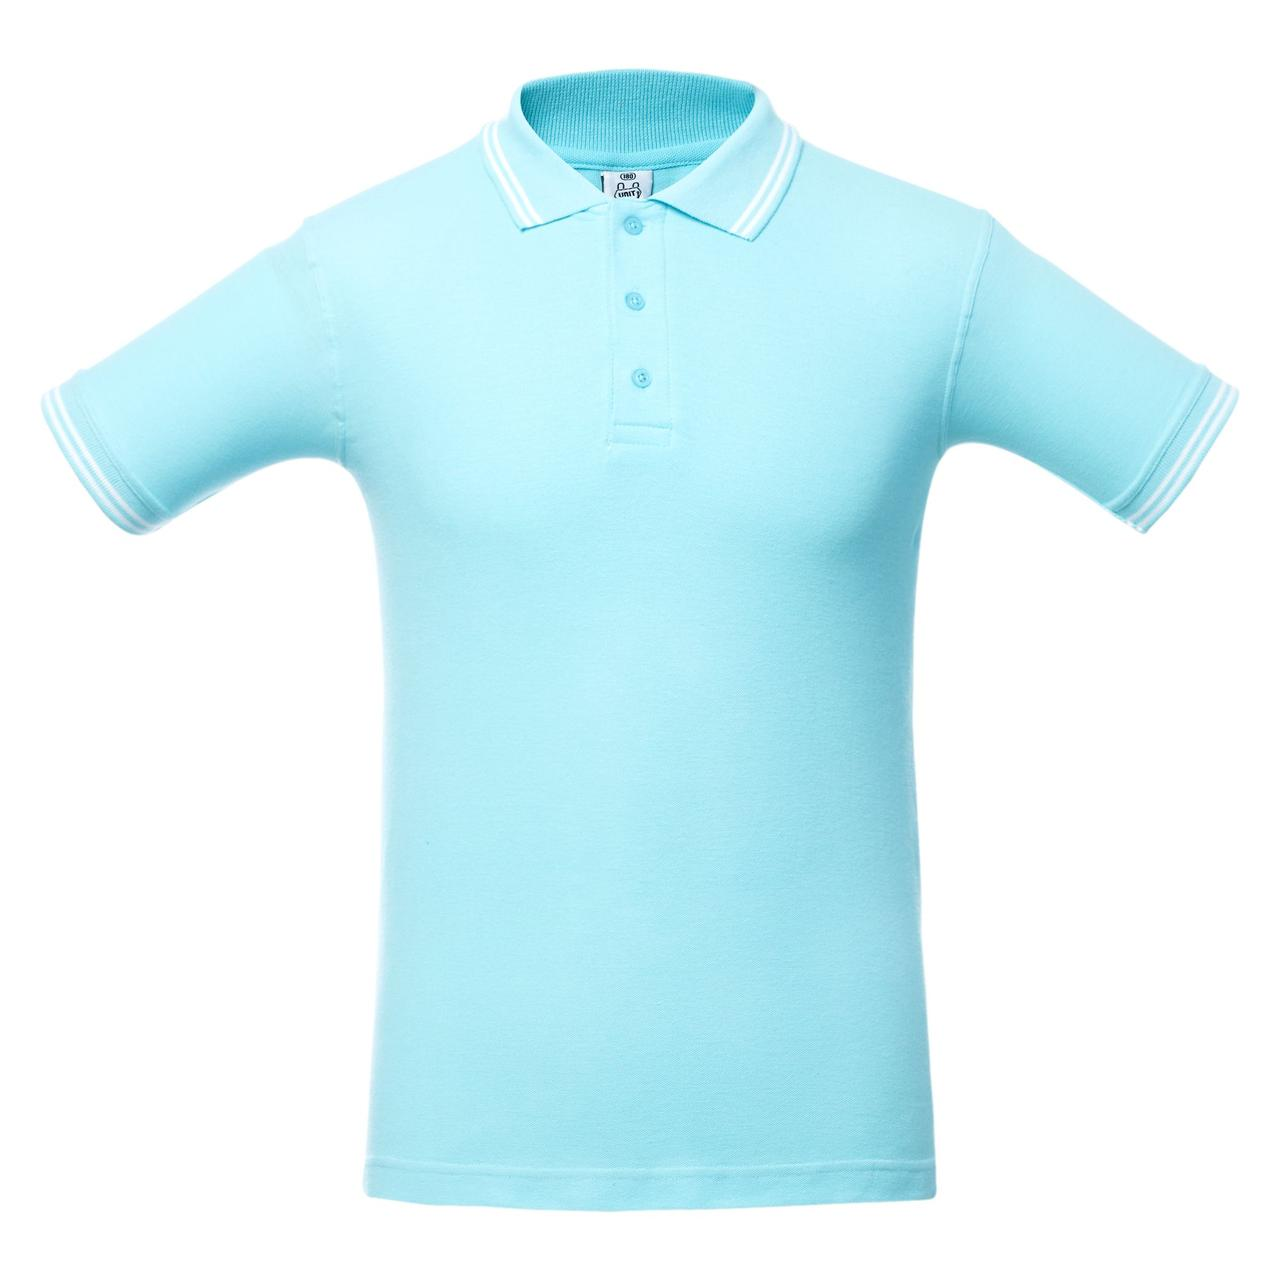 Рубашка поло Virma Stripes, светло-бирюзовая (артикул 1253.14)